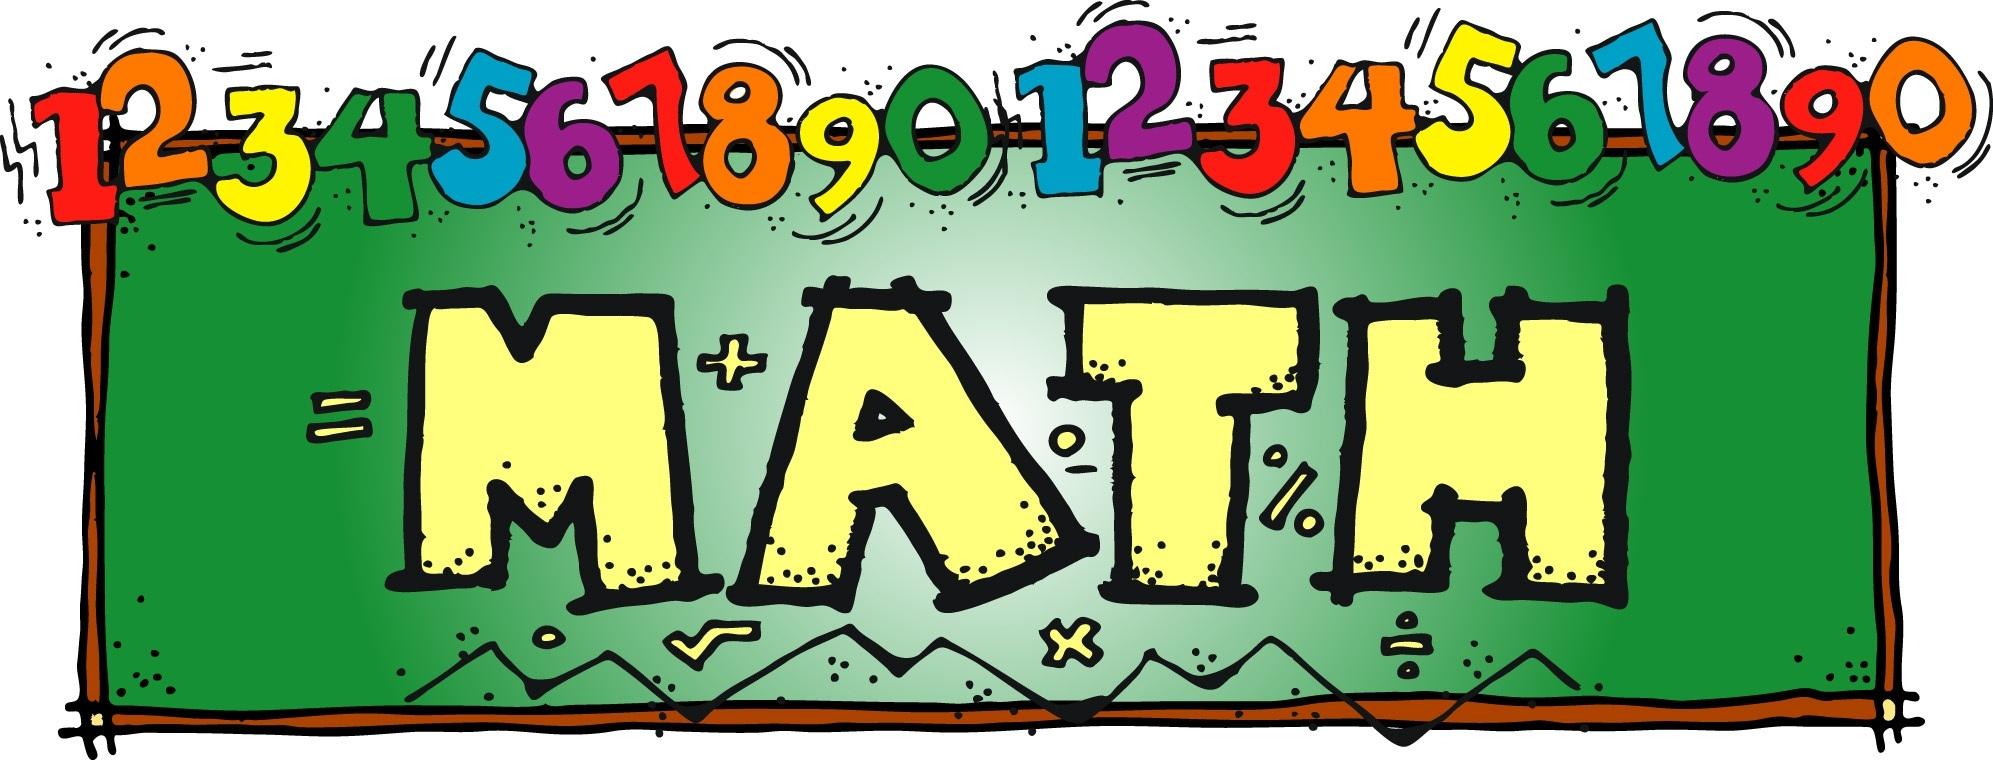 Free Math Cliparts Free Download Clip Art.